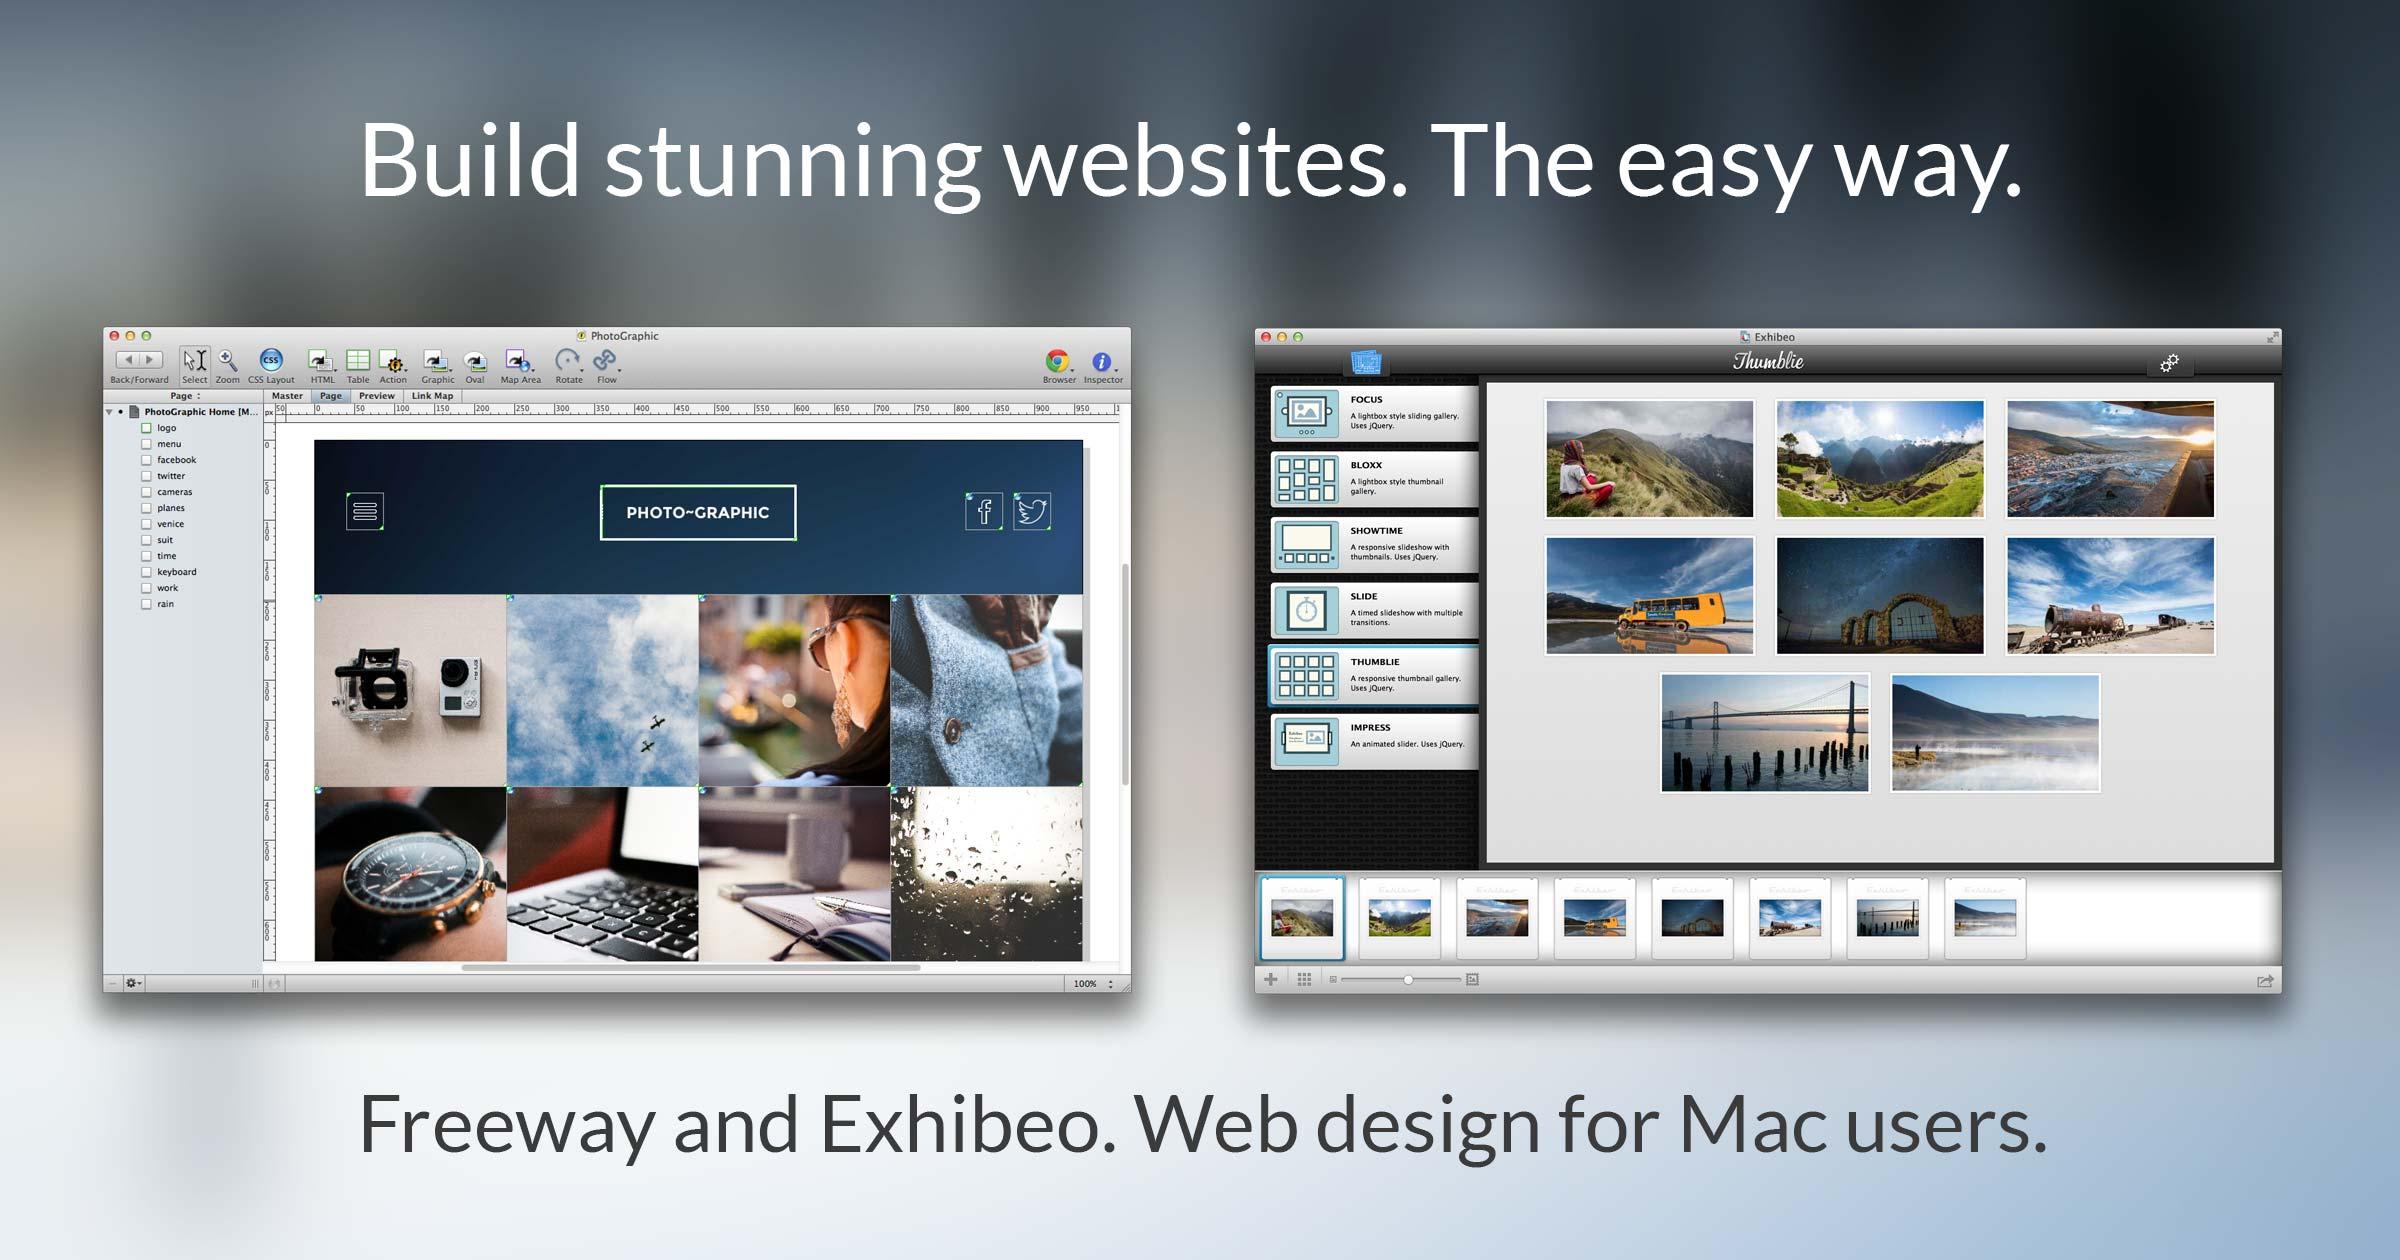 softpress rather good design software for mac